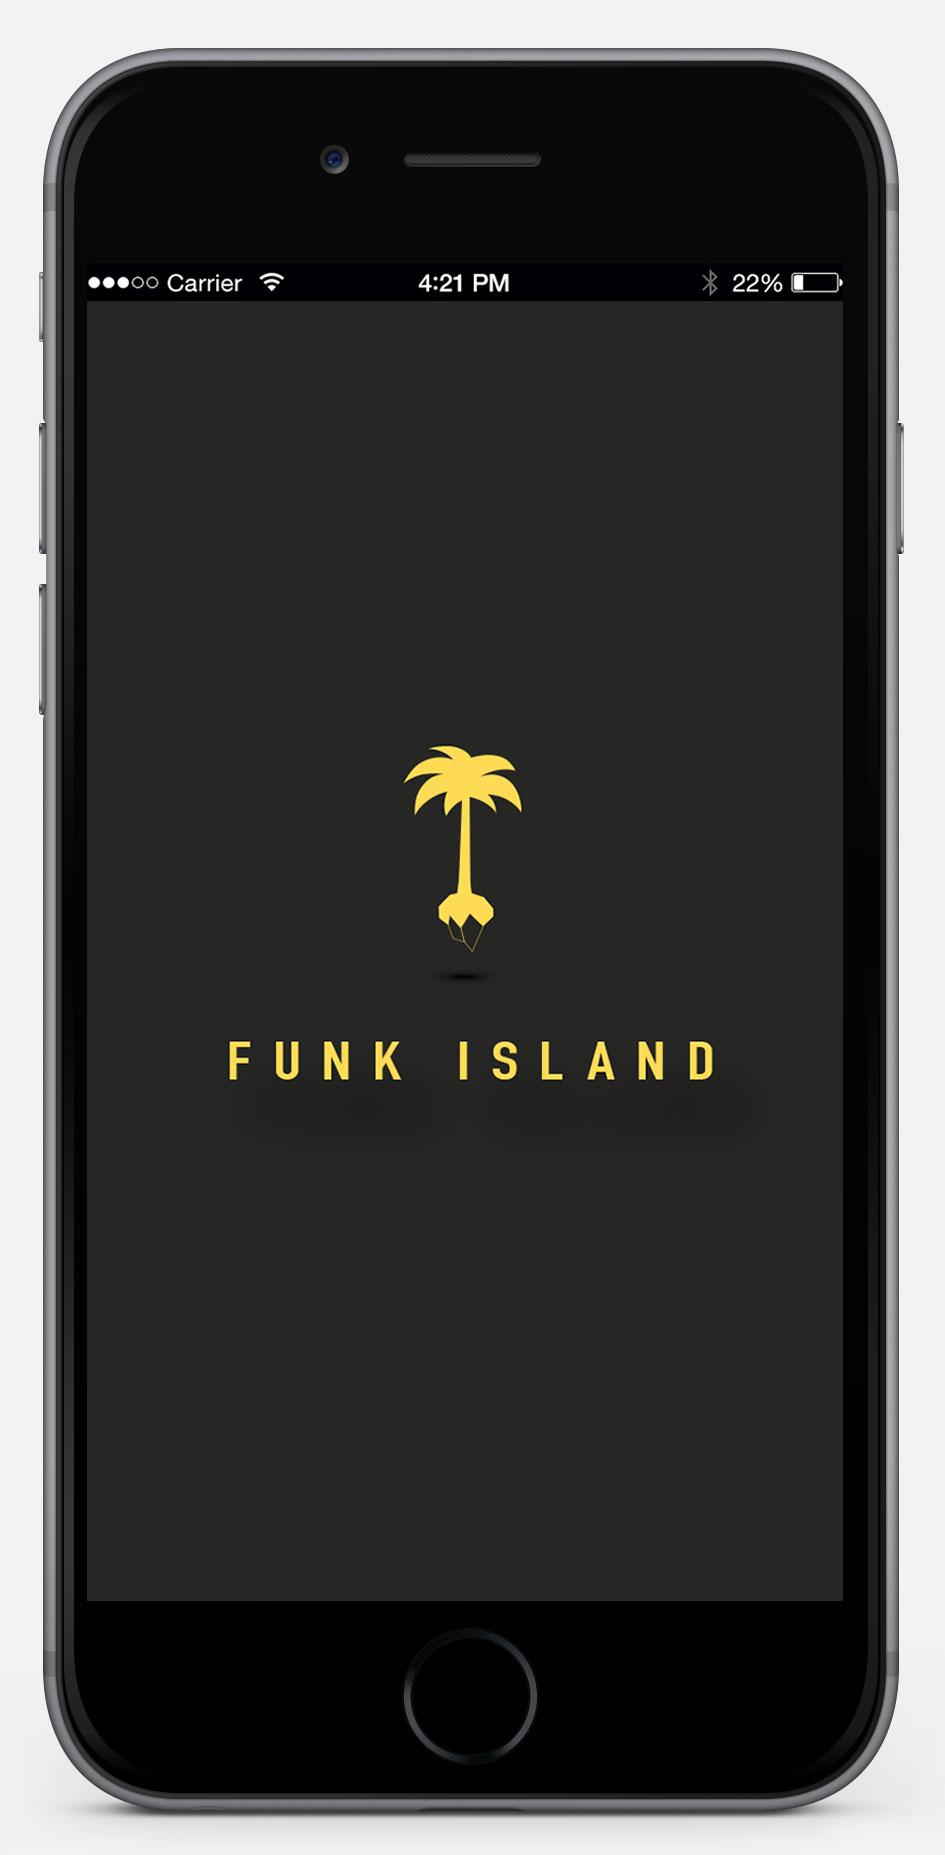 Thomas Brodin - Funk Island